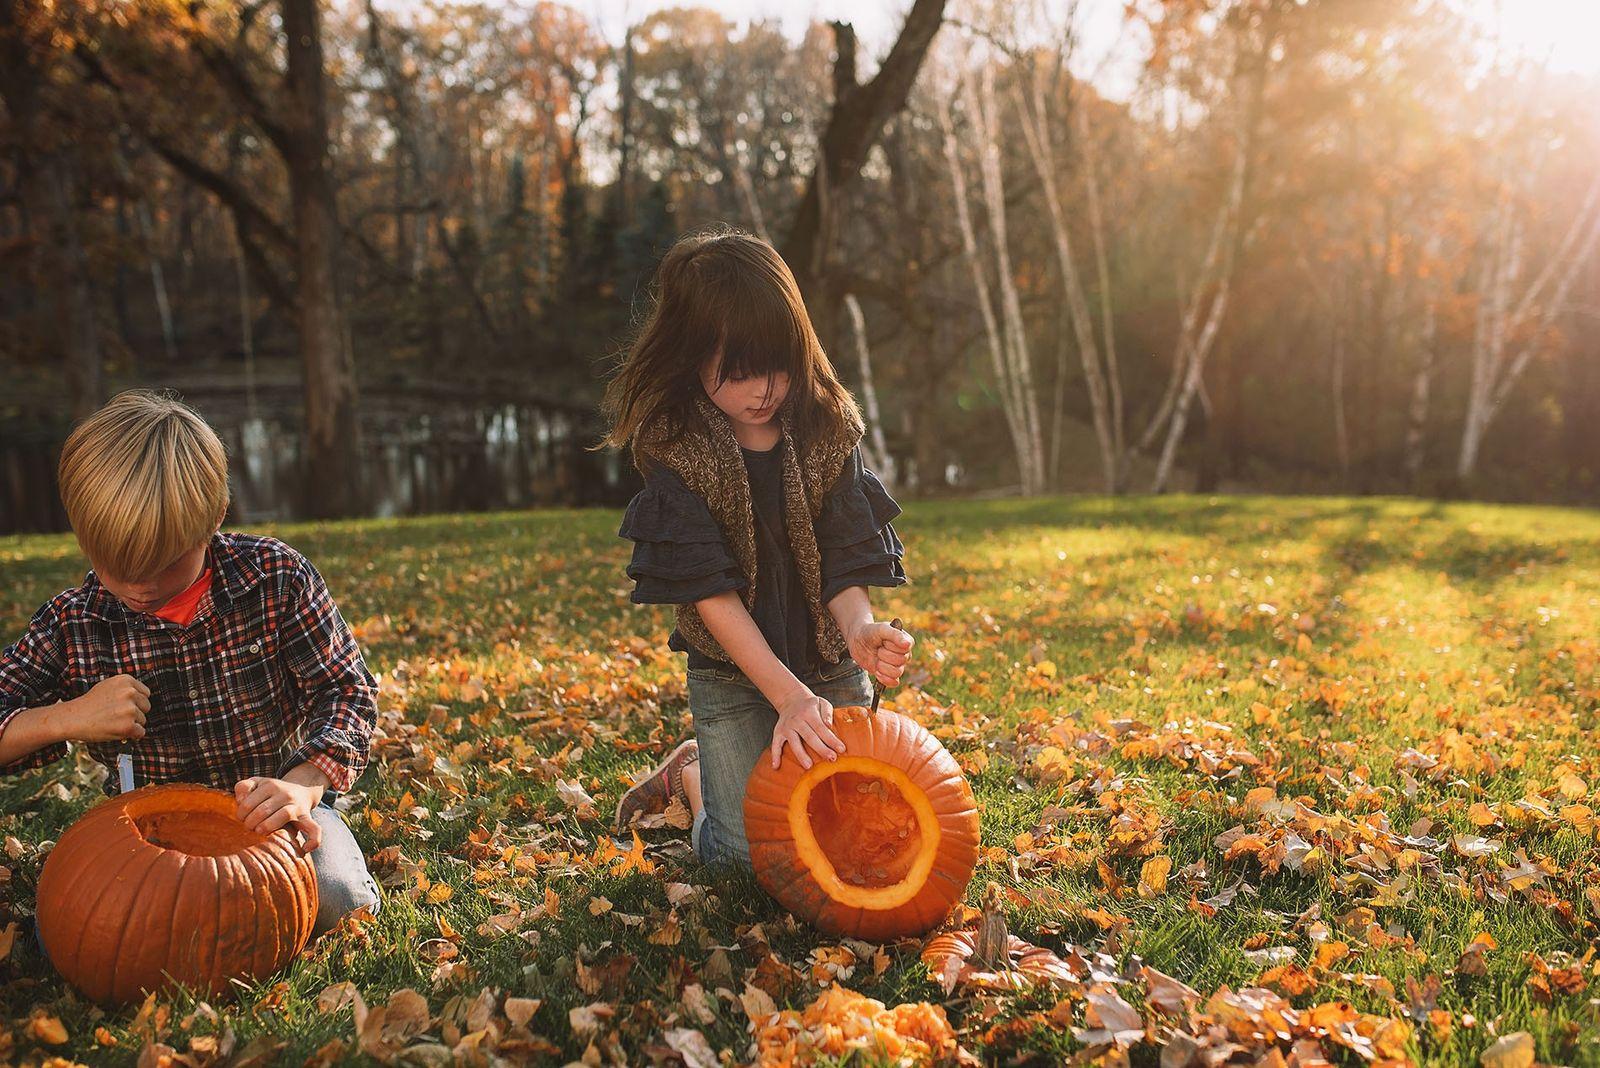 Top 10 UK Halloween activities for the family